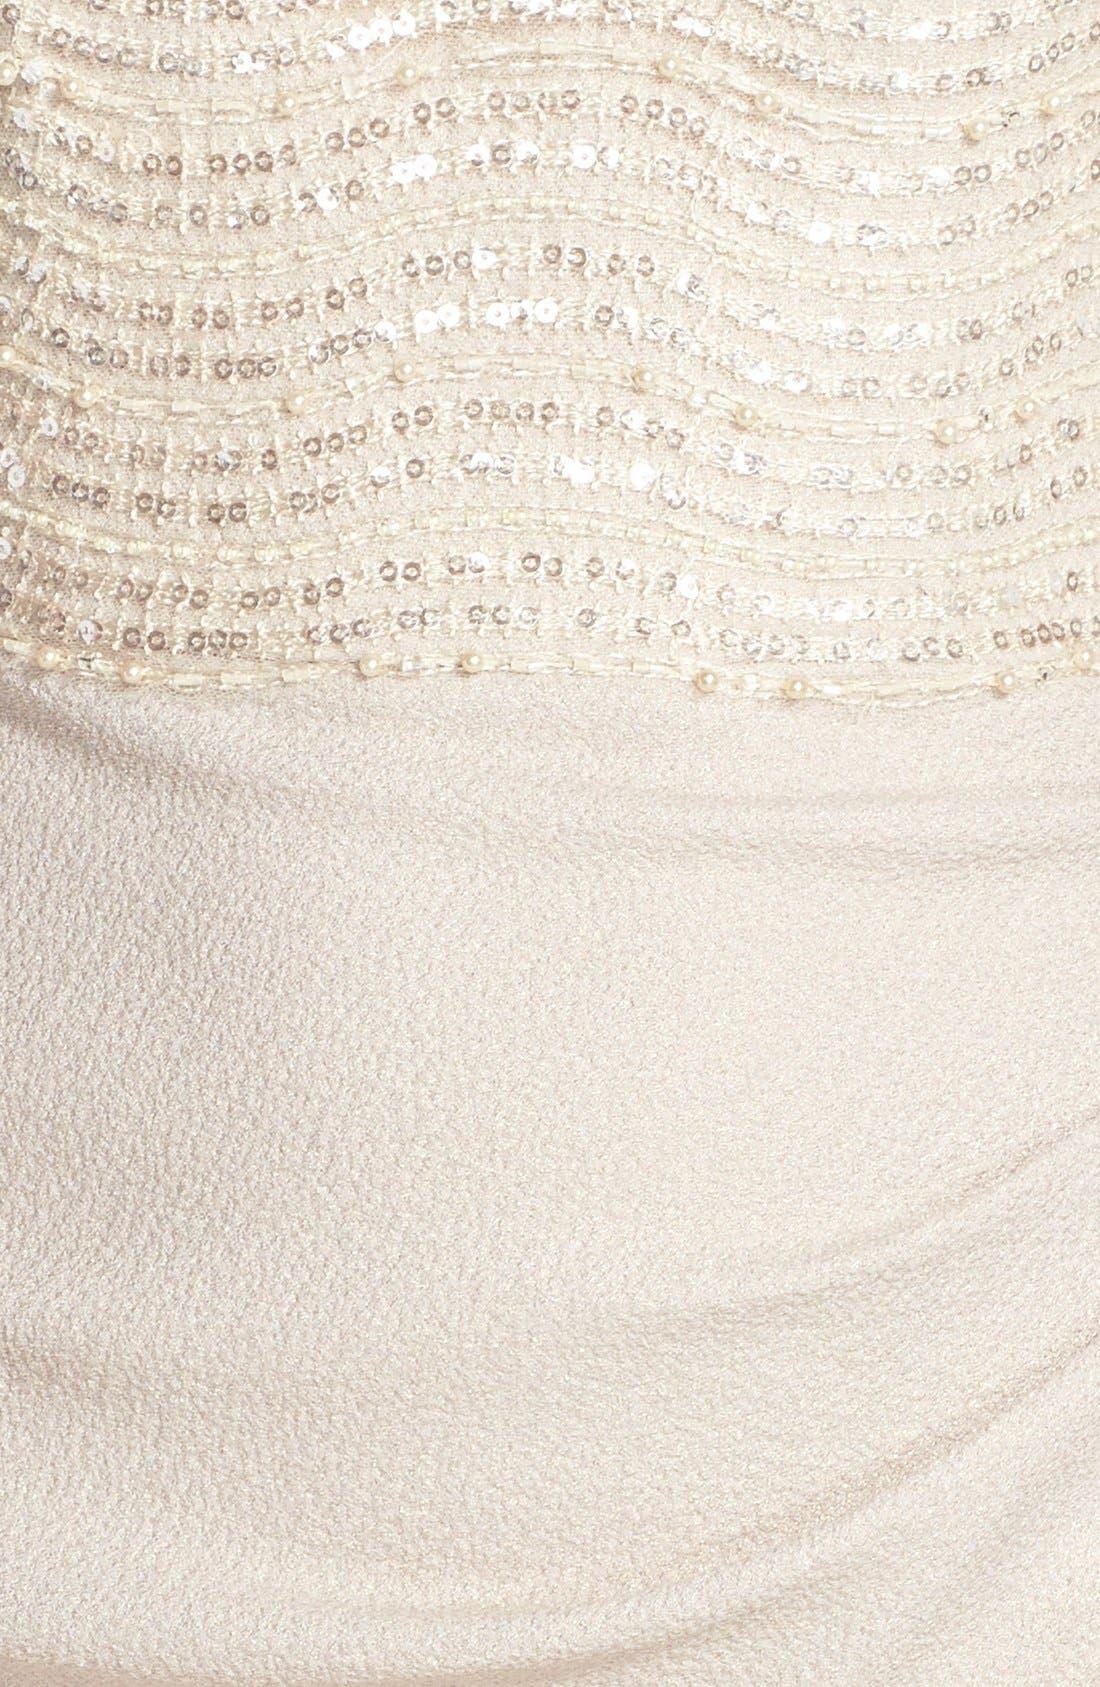 Alternate Image 3  - Badgley Mischka Embellished Illusion Crepe Gown